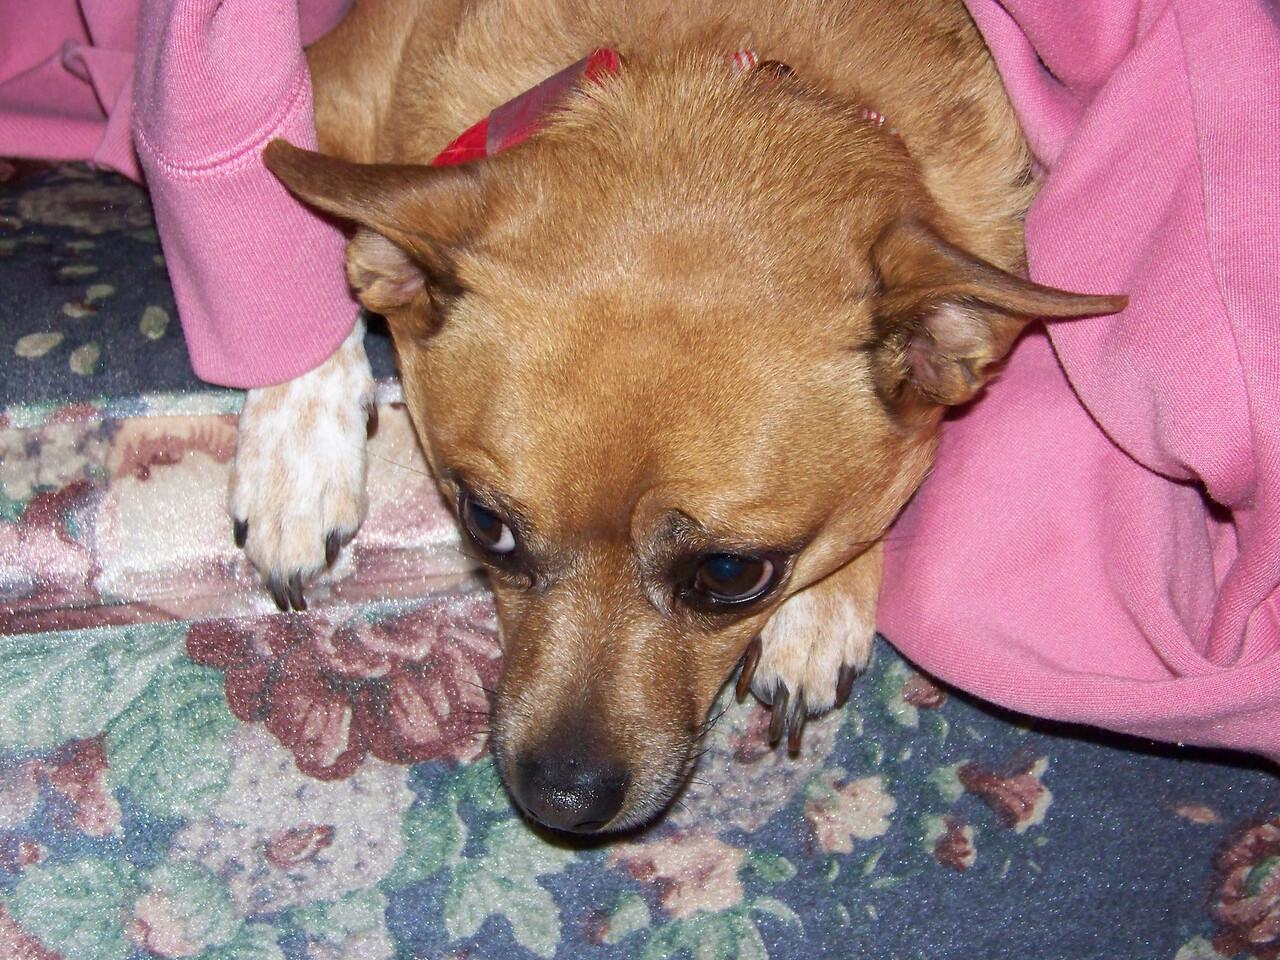 Jenna's dog Roxy.